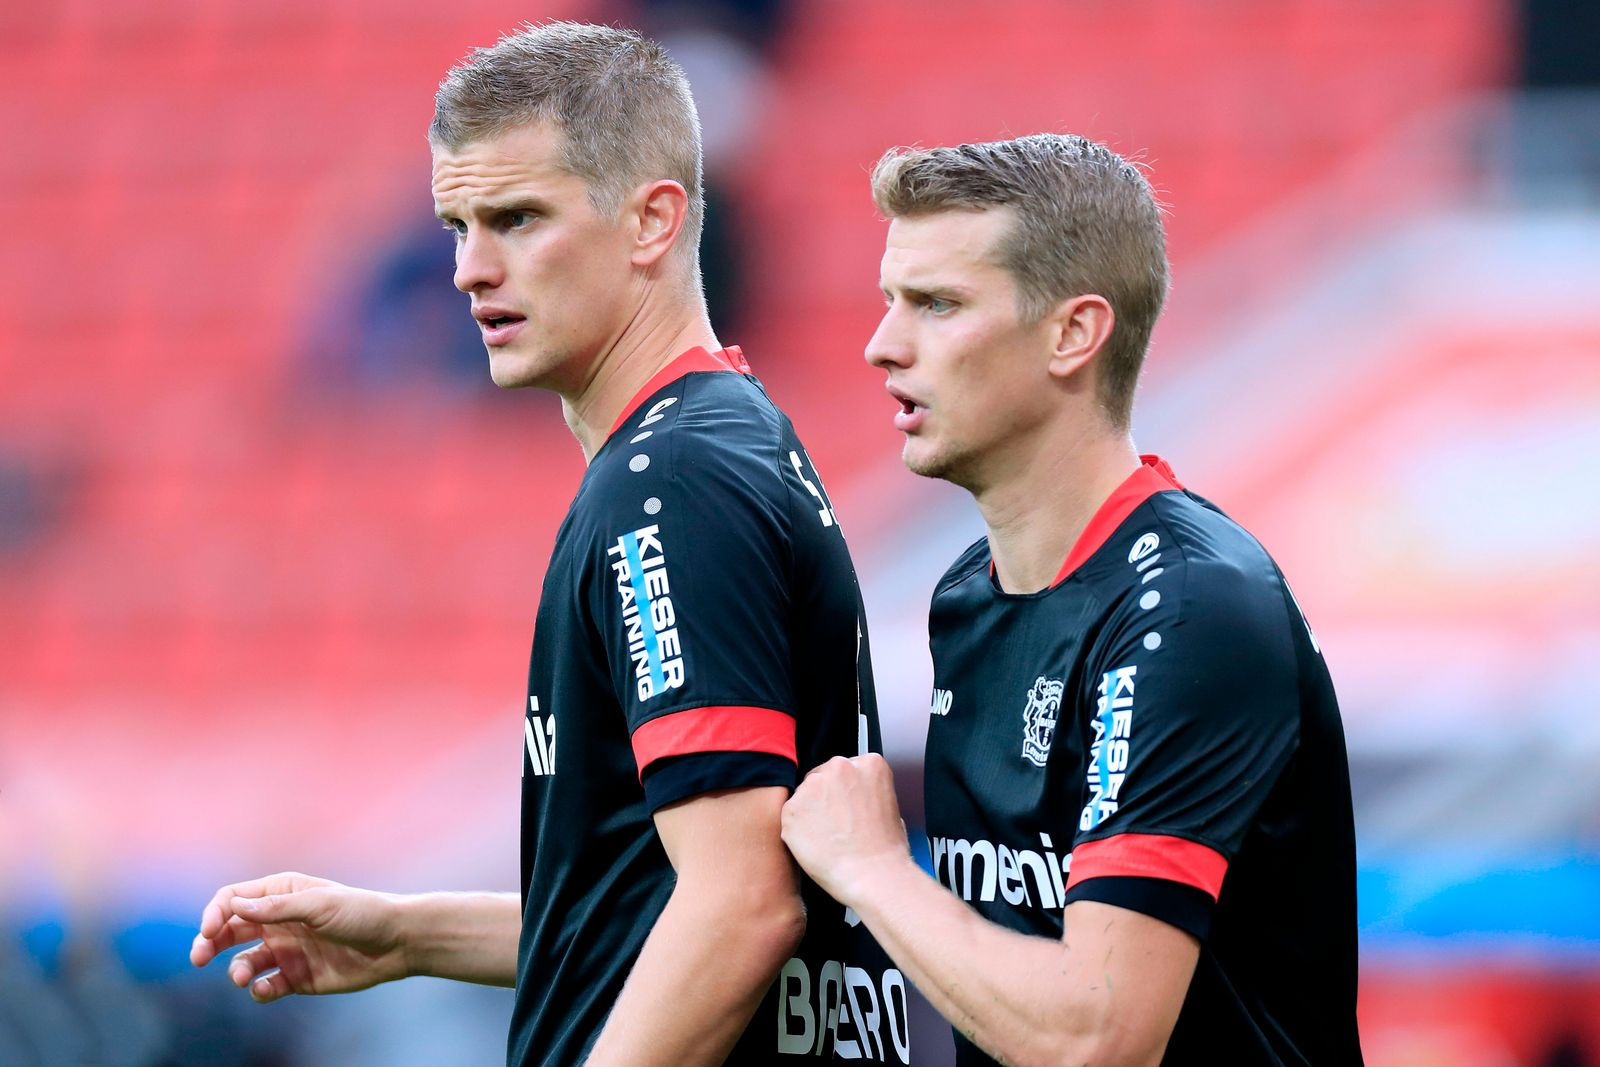 BENDER Lars und Sven Team Bayer 04 Leverkusen DFL Fussball Bundesliga Saison 2020-2021 Spiel Bayer 04 Leverkusen - RB Le